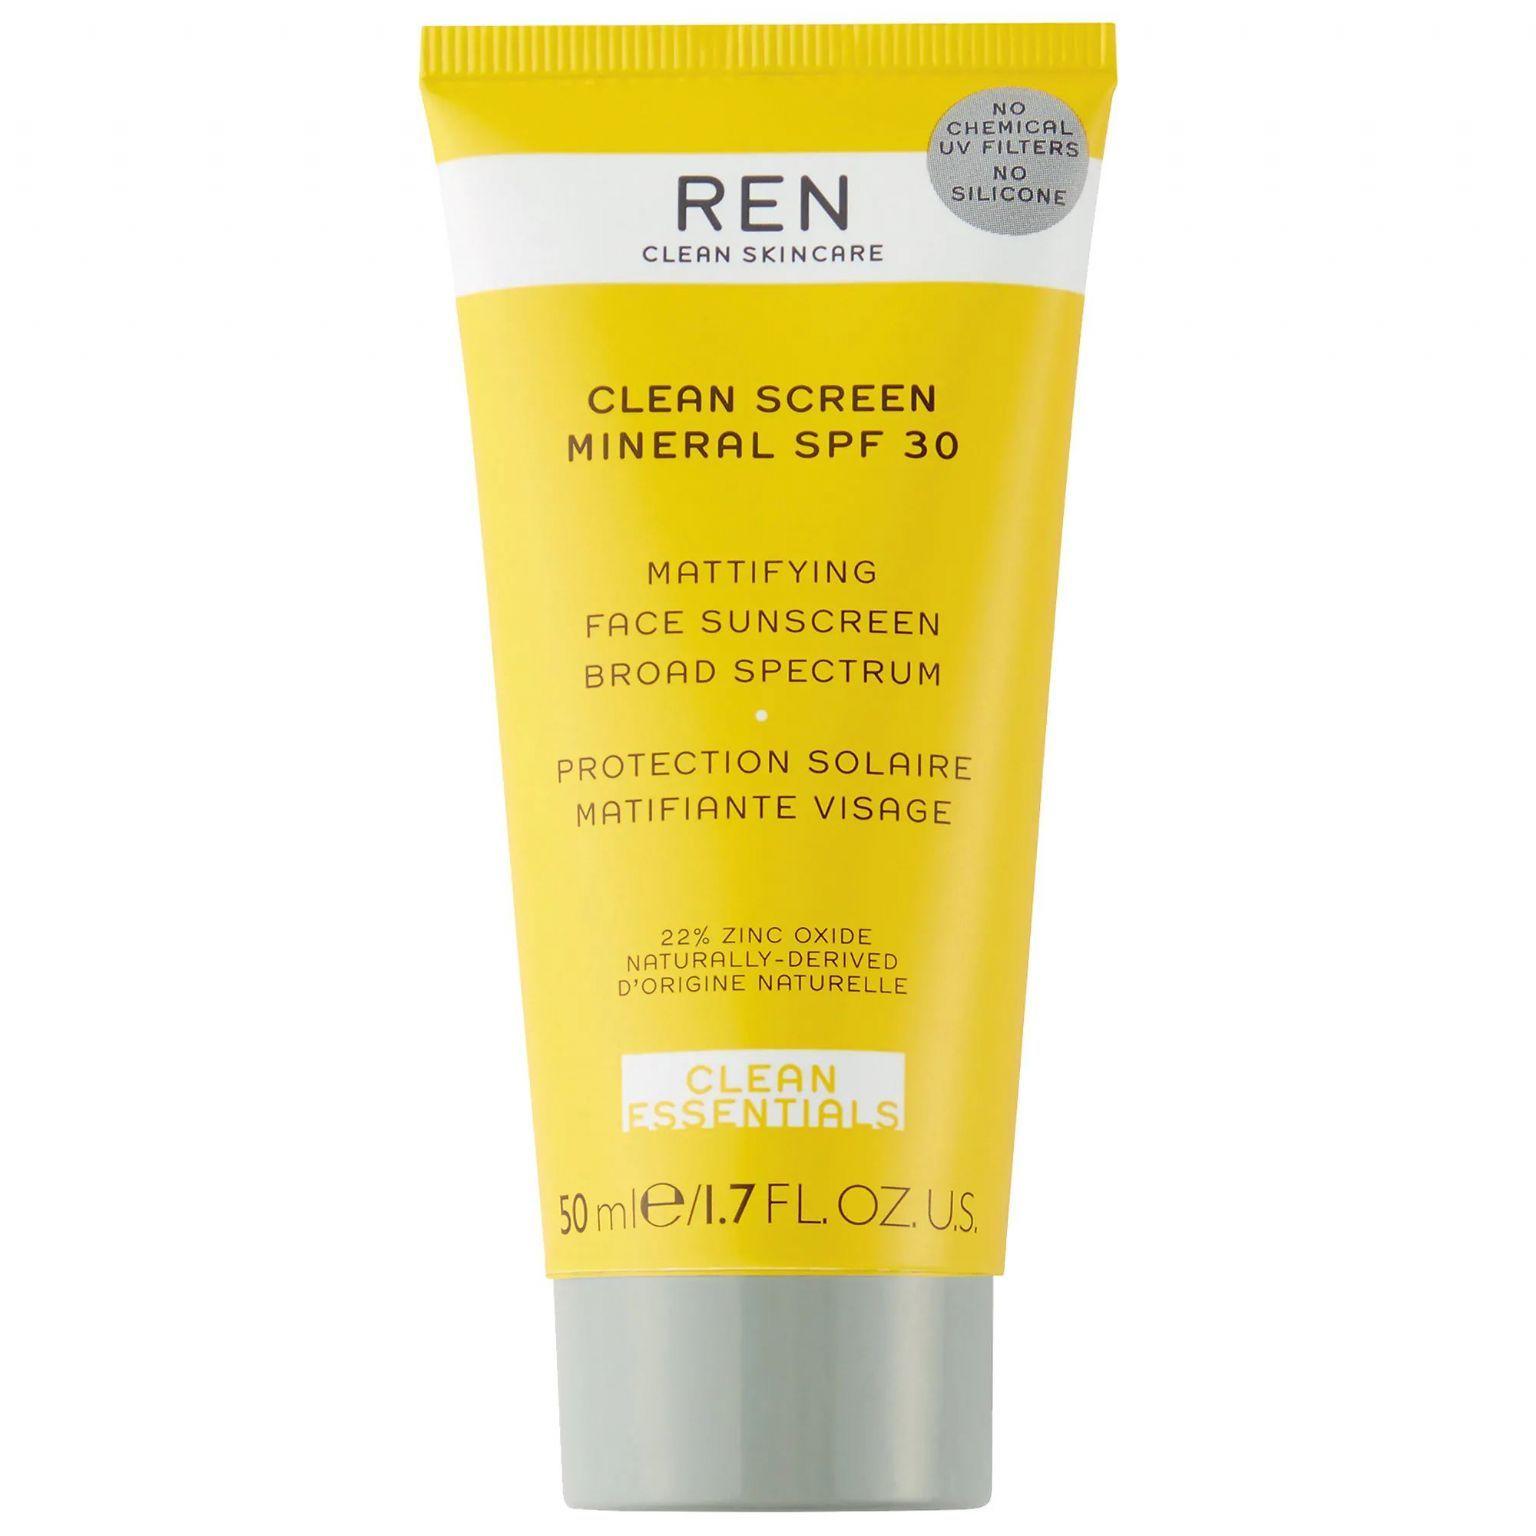 CLEAN SCREEN Mineral SPF 30 Mattifying Face Sunscreen Broad Spectrum